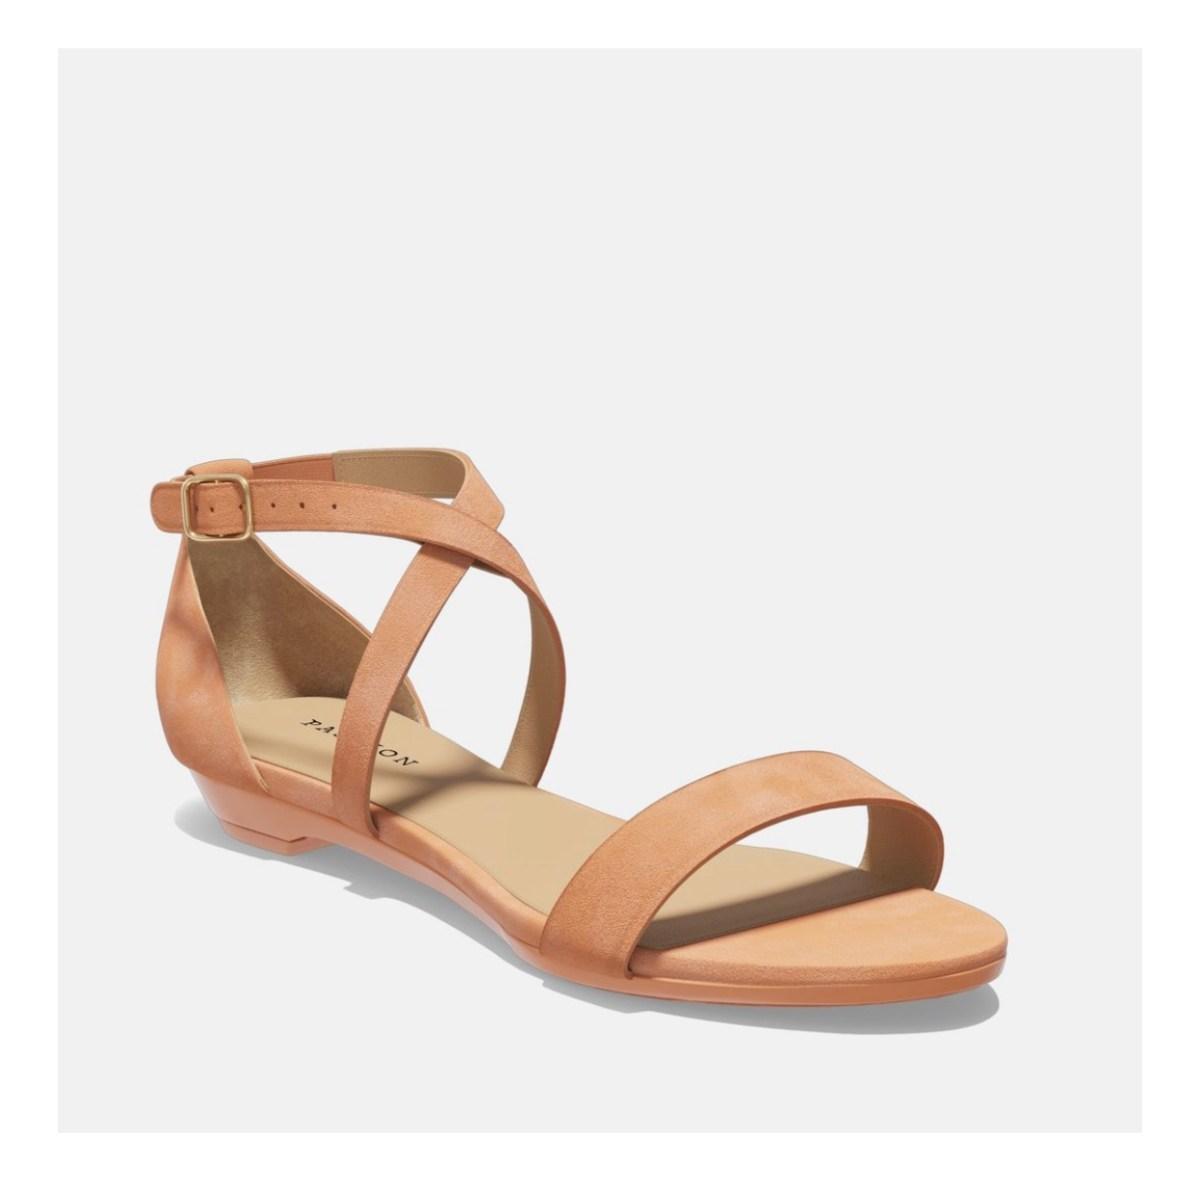 Pashion Footwear Sandal flat